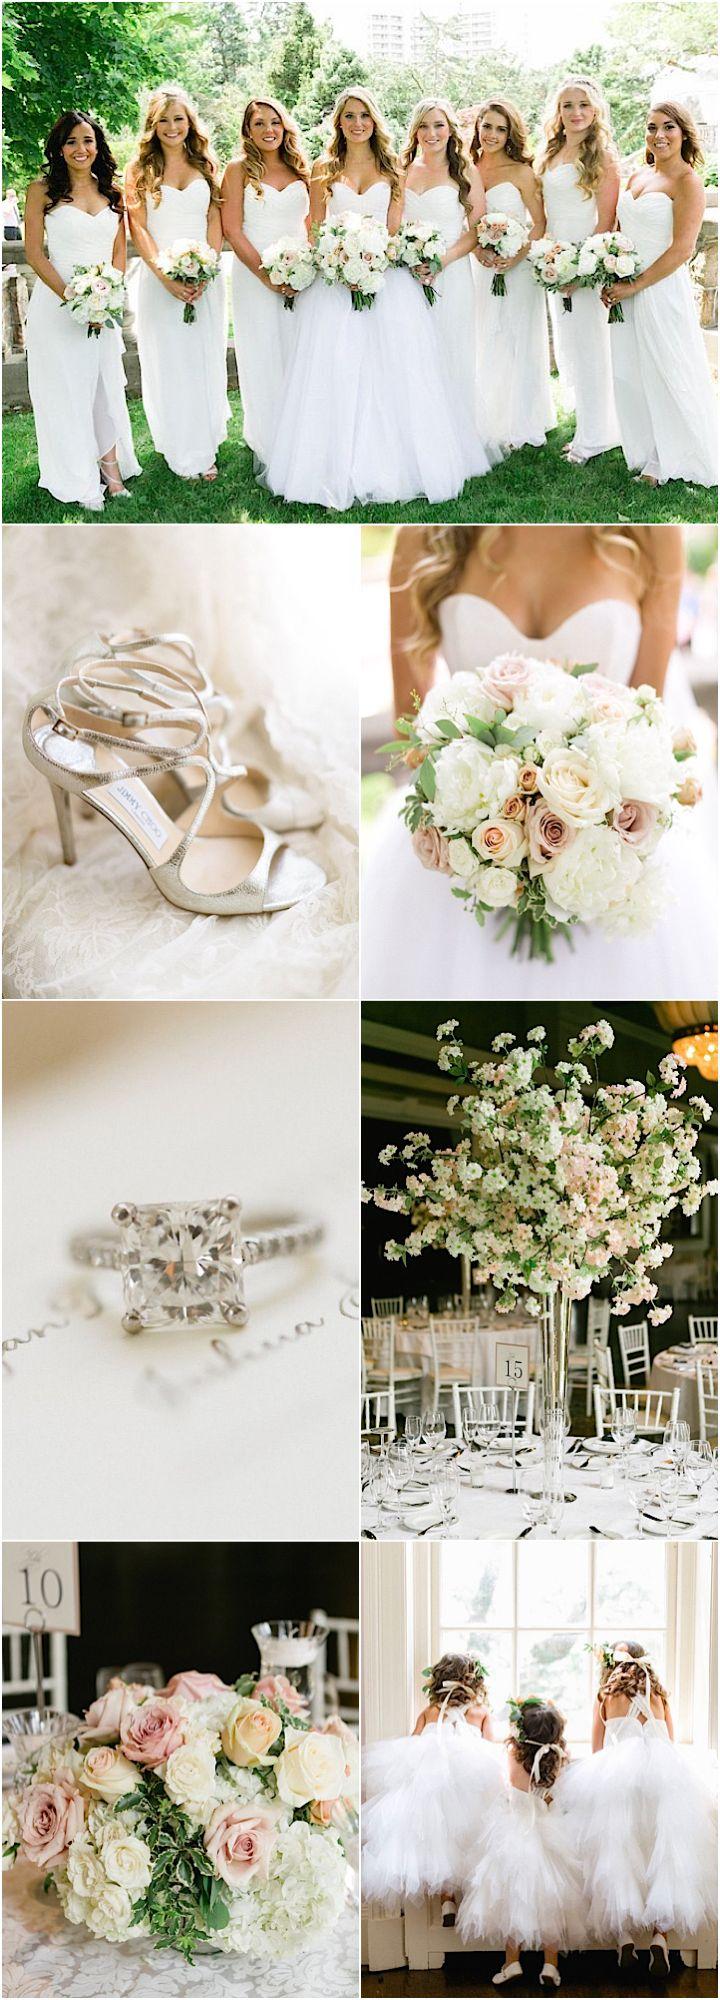 Featured Photography: Corina V. Photography; elegant wedding reception and fashion details